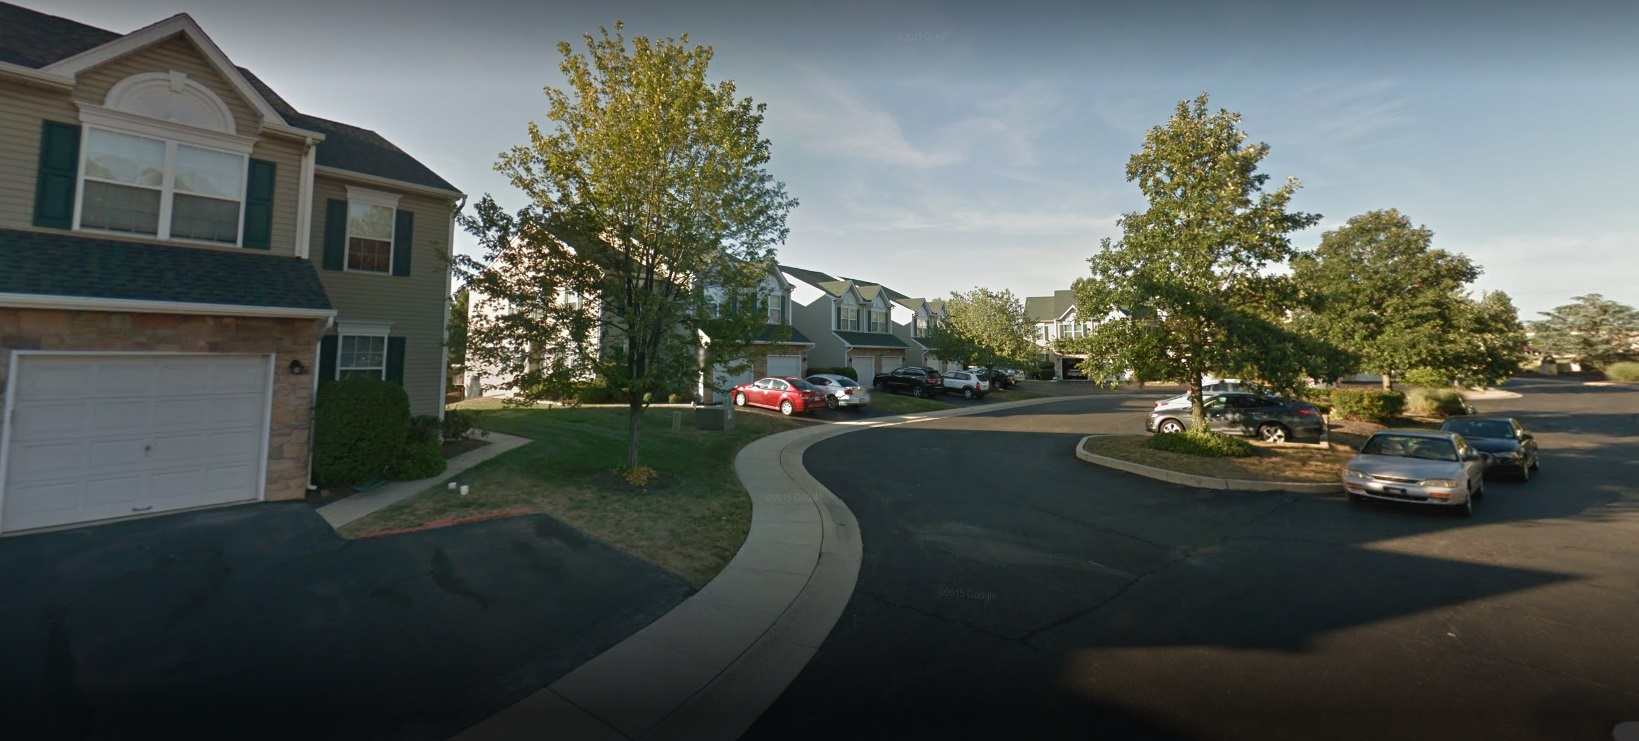 Club View Manor - Google - 2015.jpg